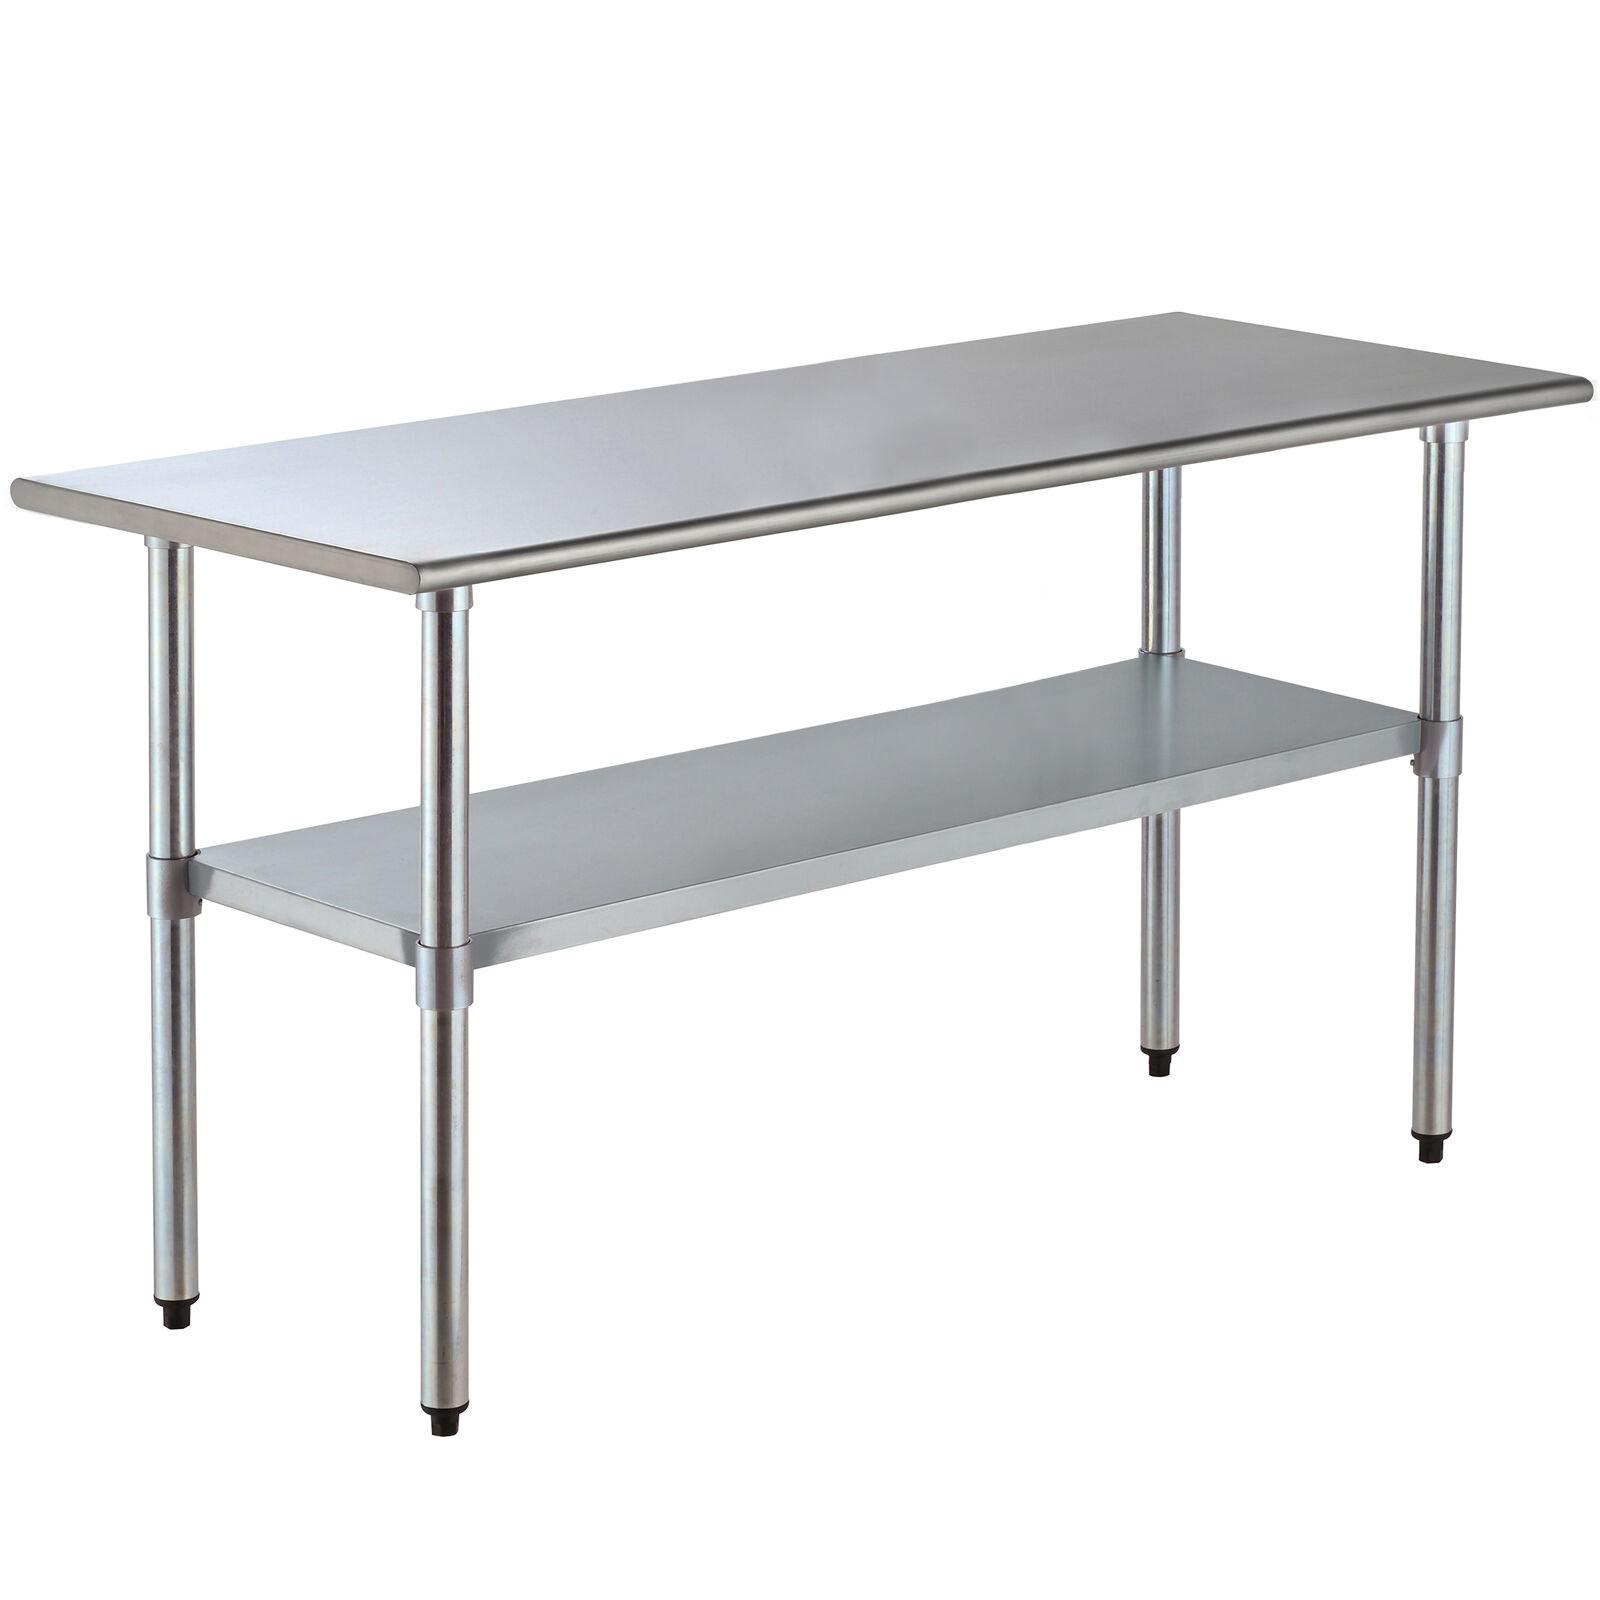 30 x 72 stainless steel commercial kitchen restaurant work prep table